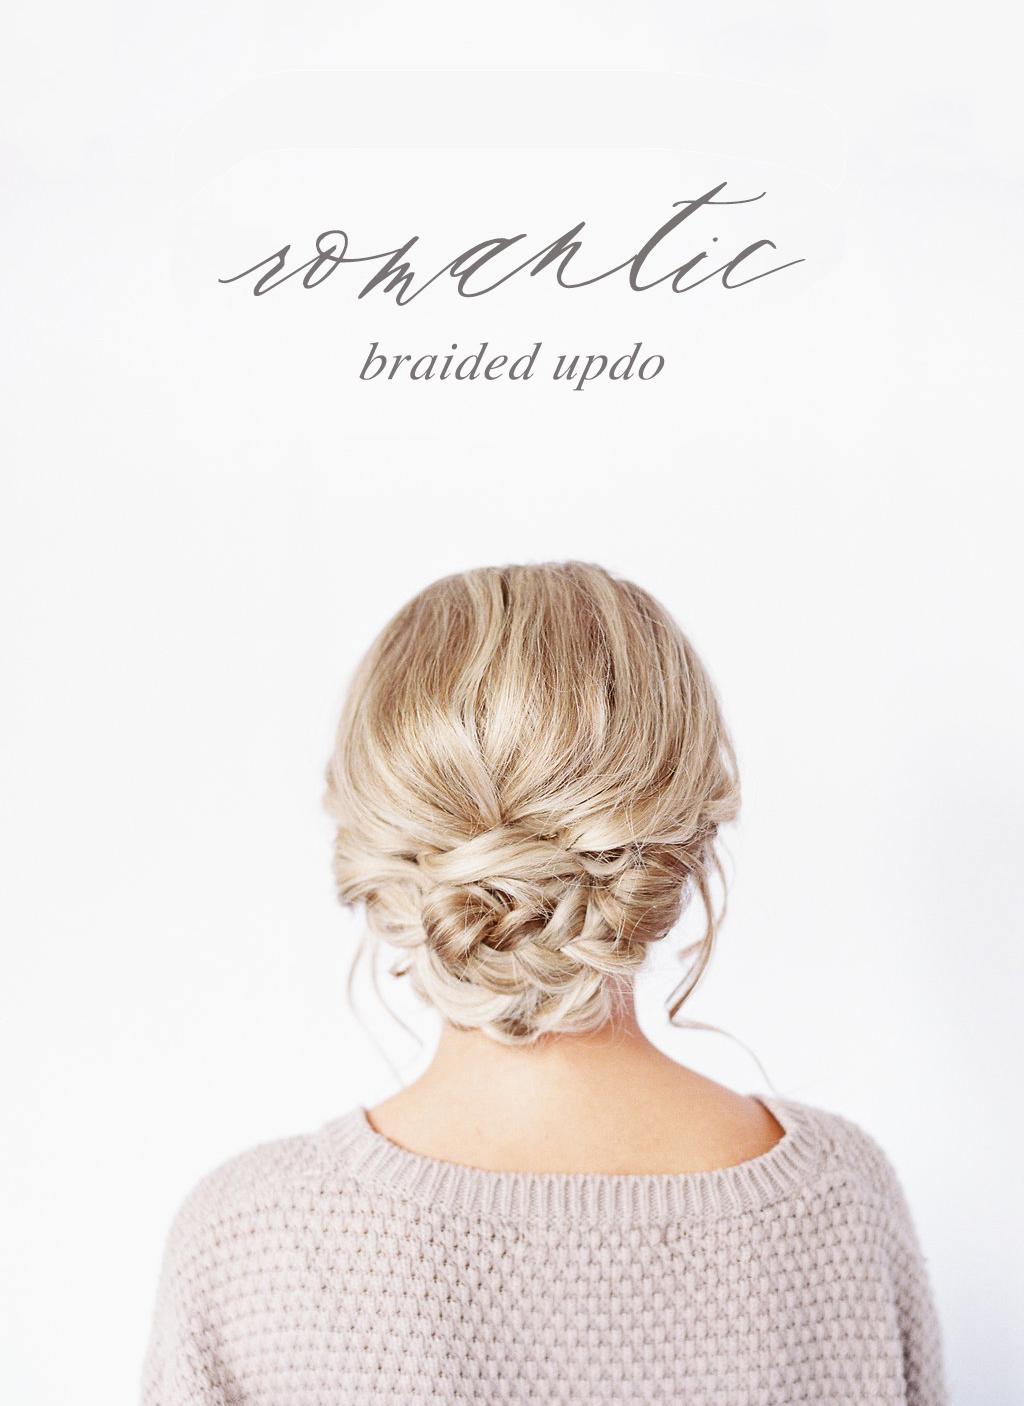 romantic braided updo wedding bridal hairstyle tutorial DIY braid elegant hair // www.hannahforsberg.com-atlanta-wedding-photographer-hair-makeup-tutorial-diy-romantic-updo.jpg